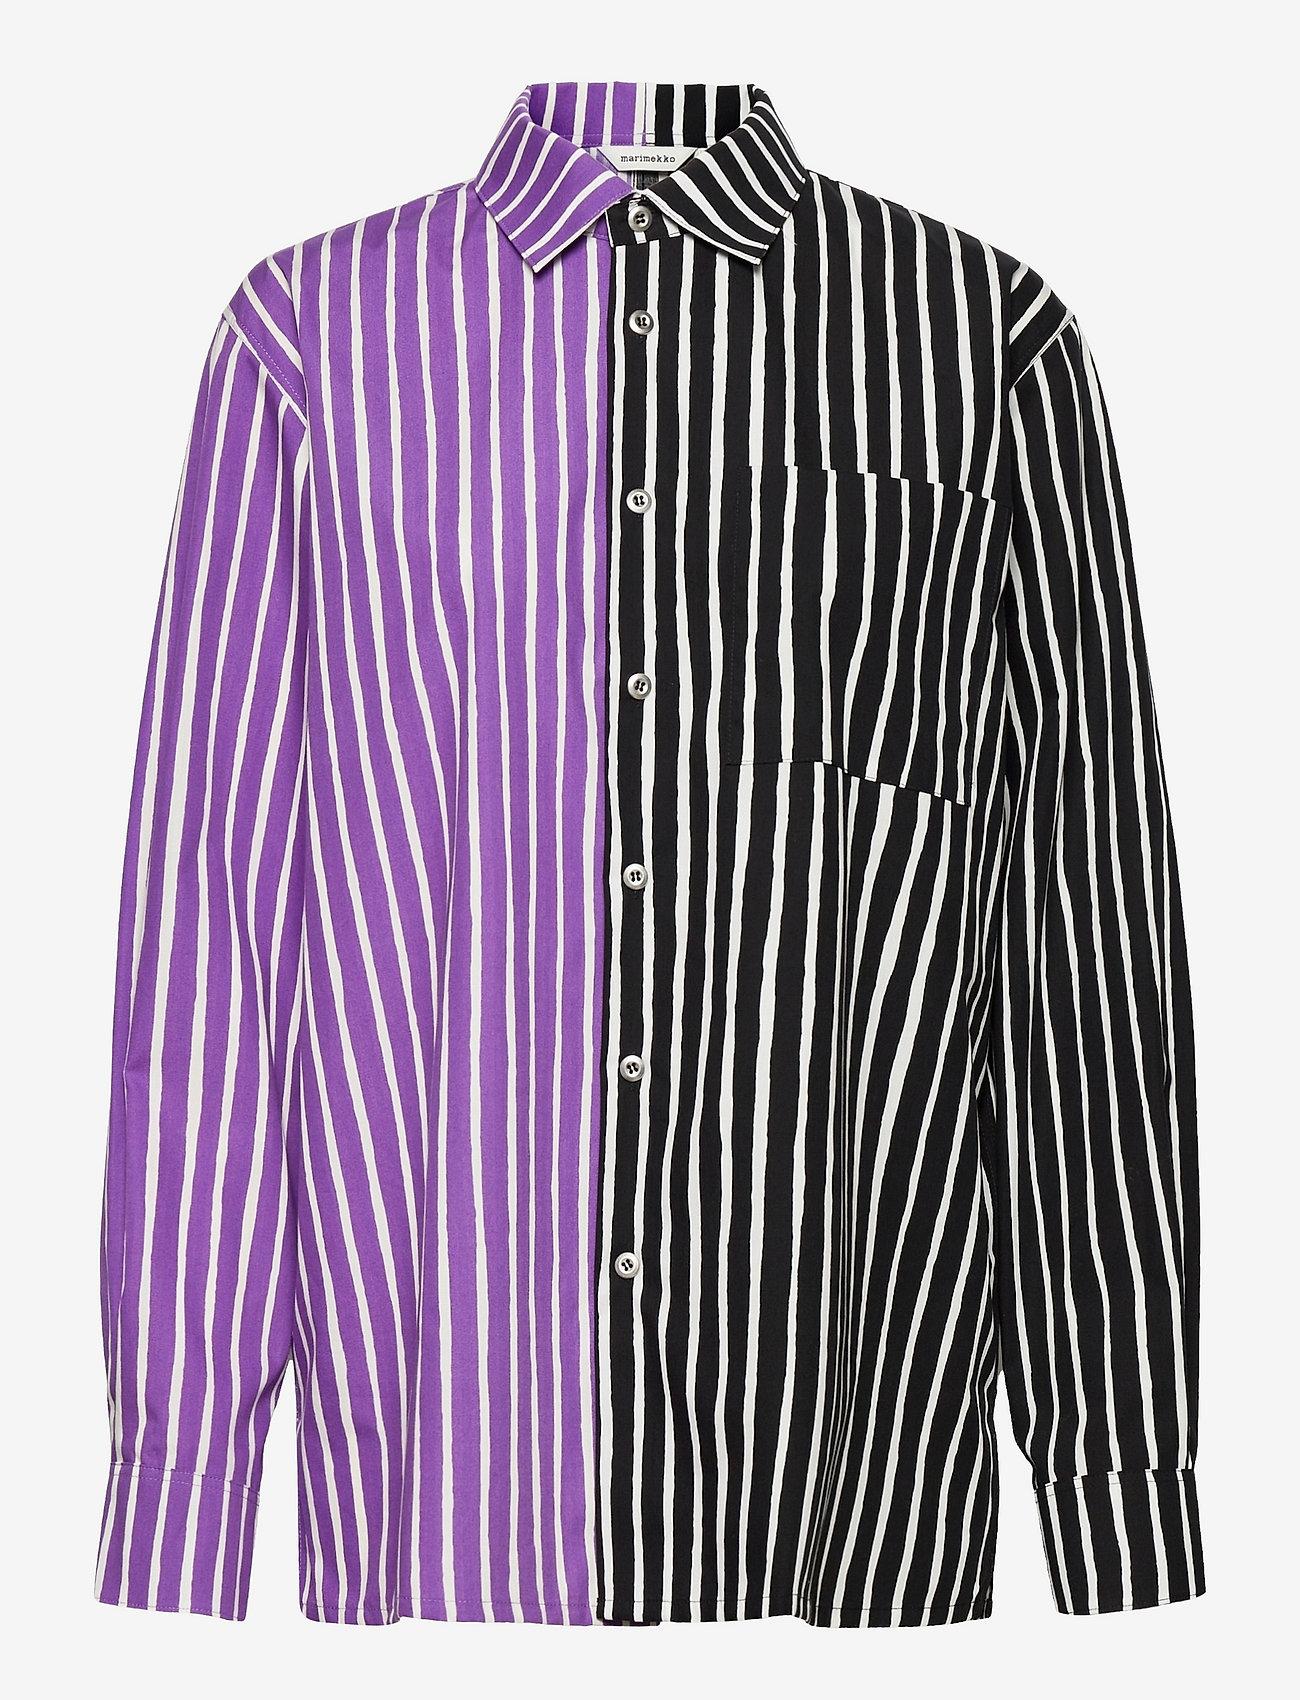 Marimekko - JOKAPOIKA 2017 MIX SHIRT - langærmede skjorter - violet, black - 0